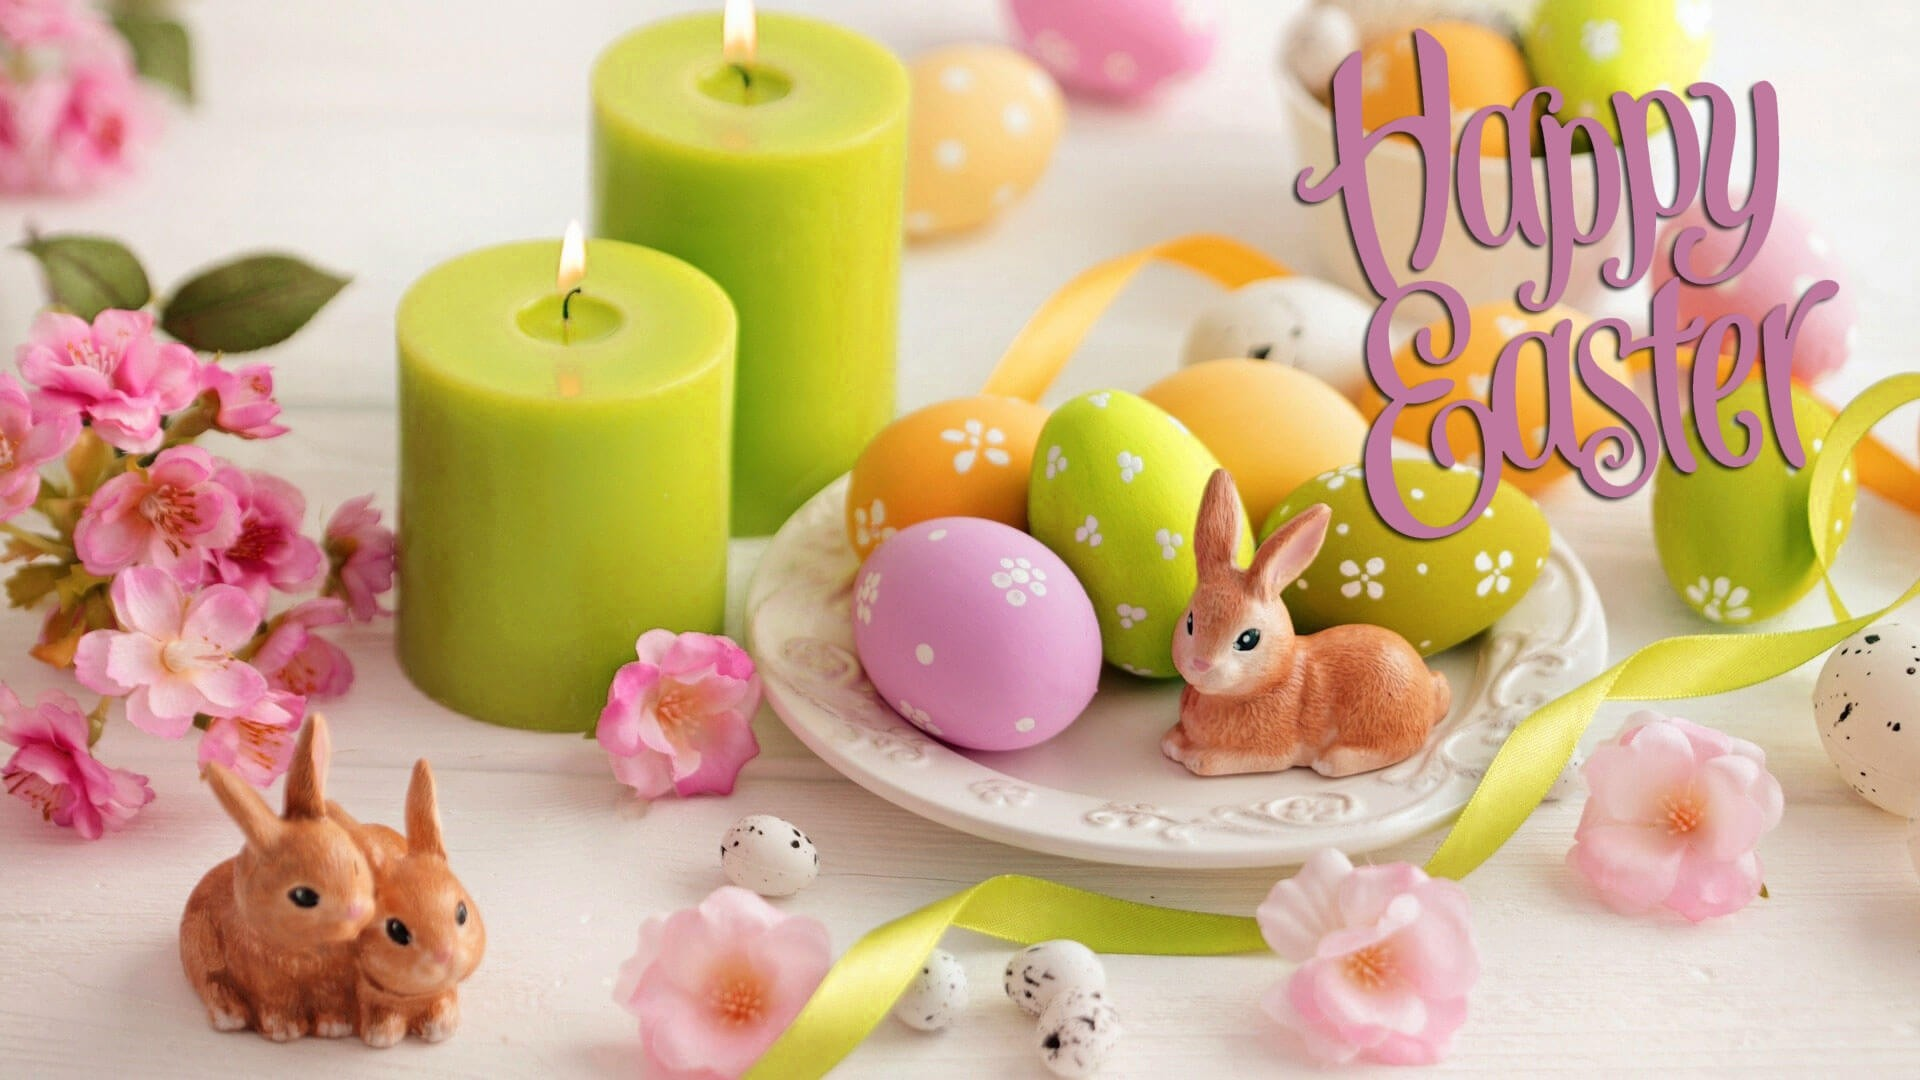 Cute Easter Wallpaper Desktop